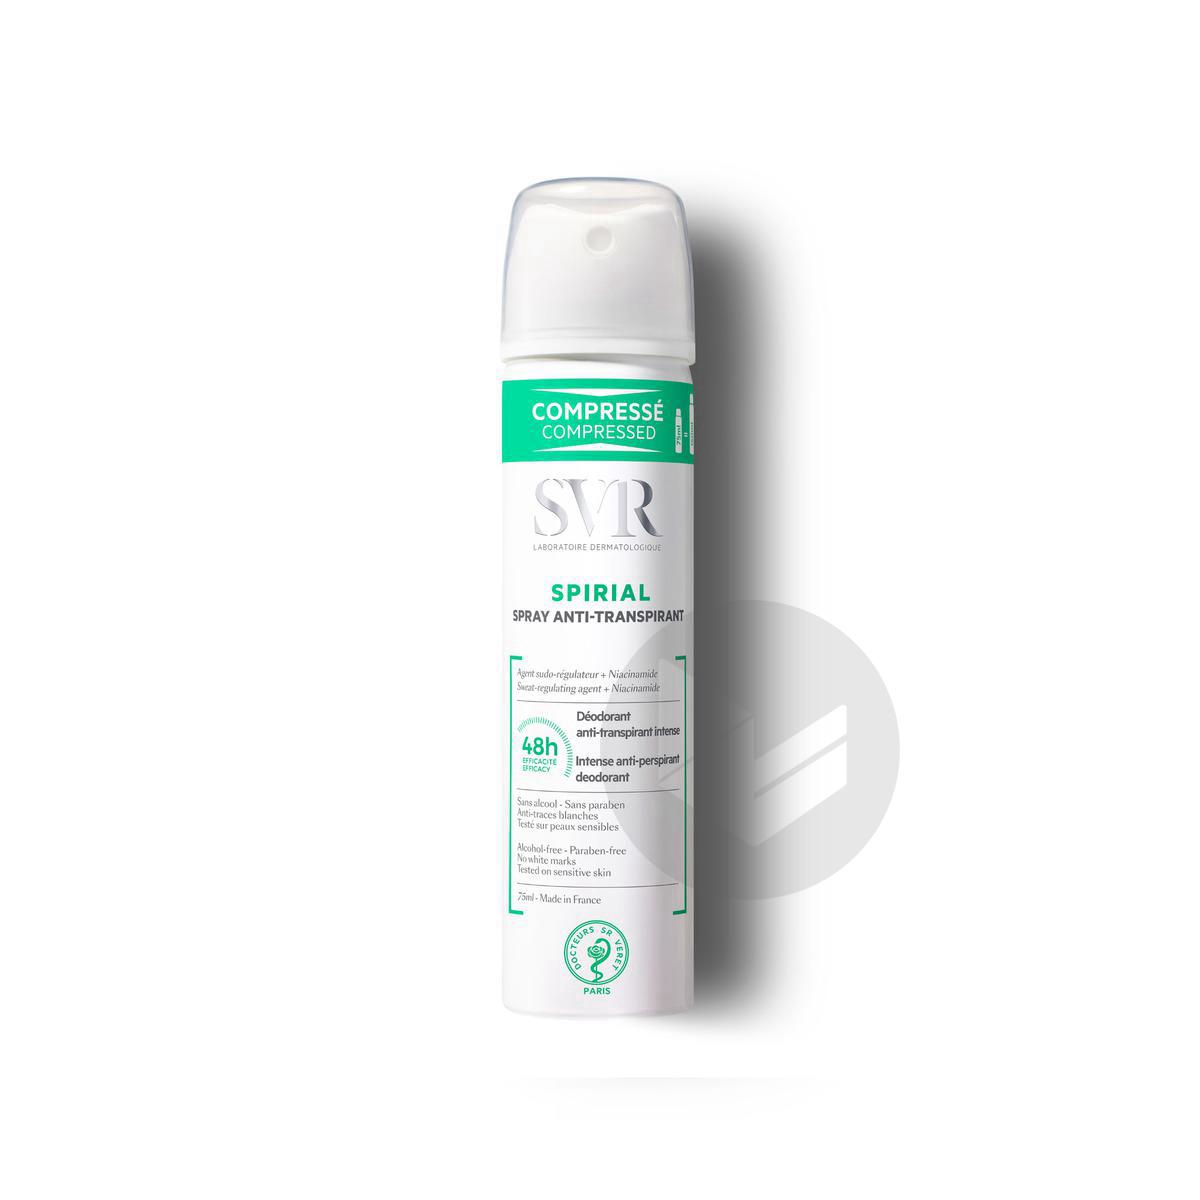 SPIRIAL Spray Anti-Transpirant 75 ml